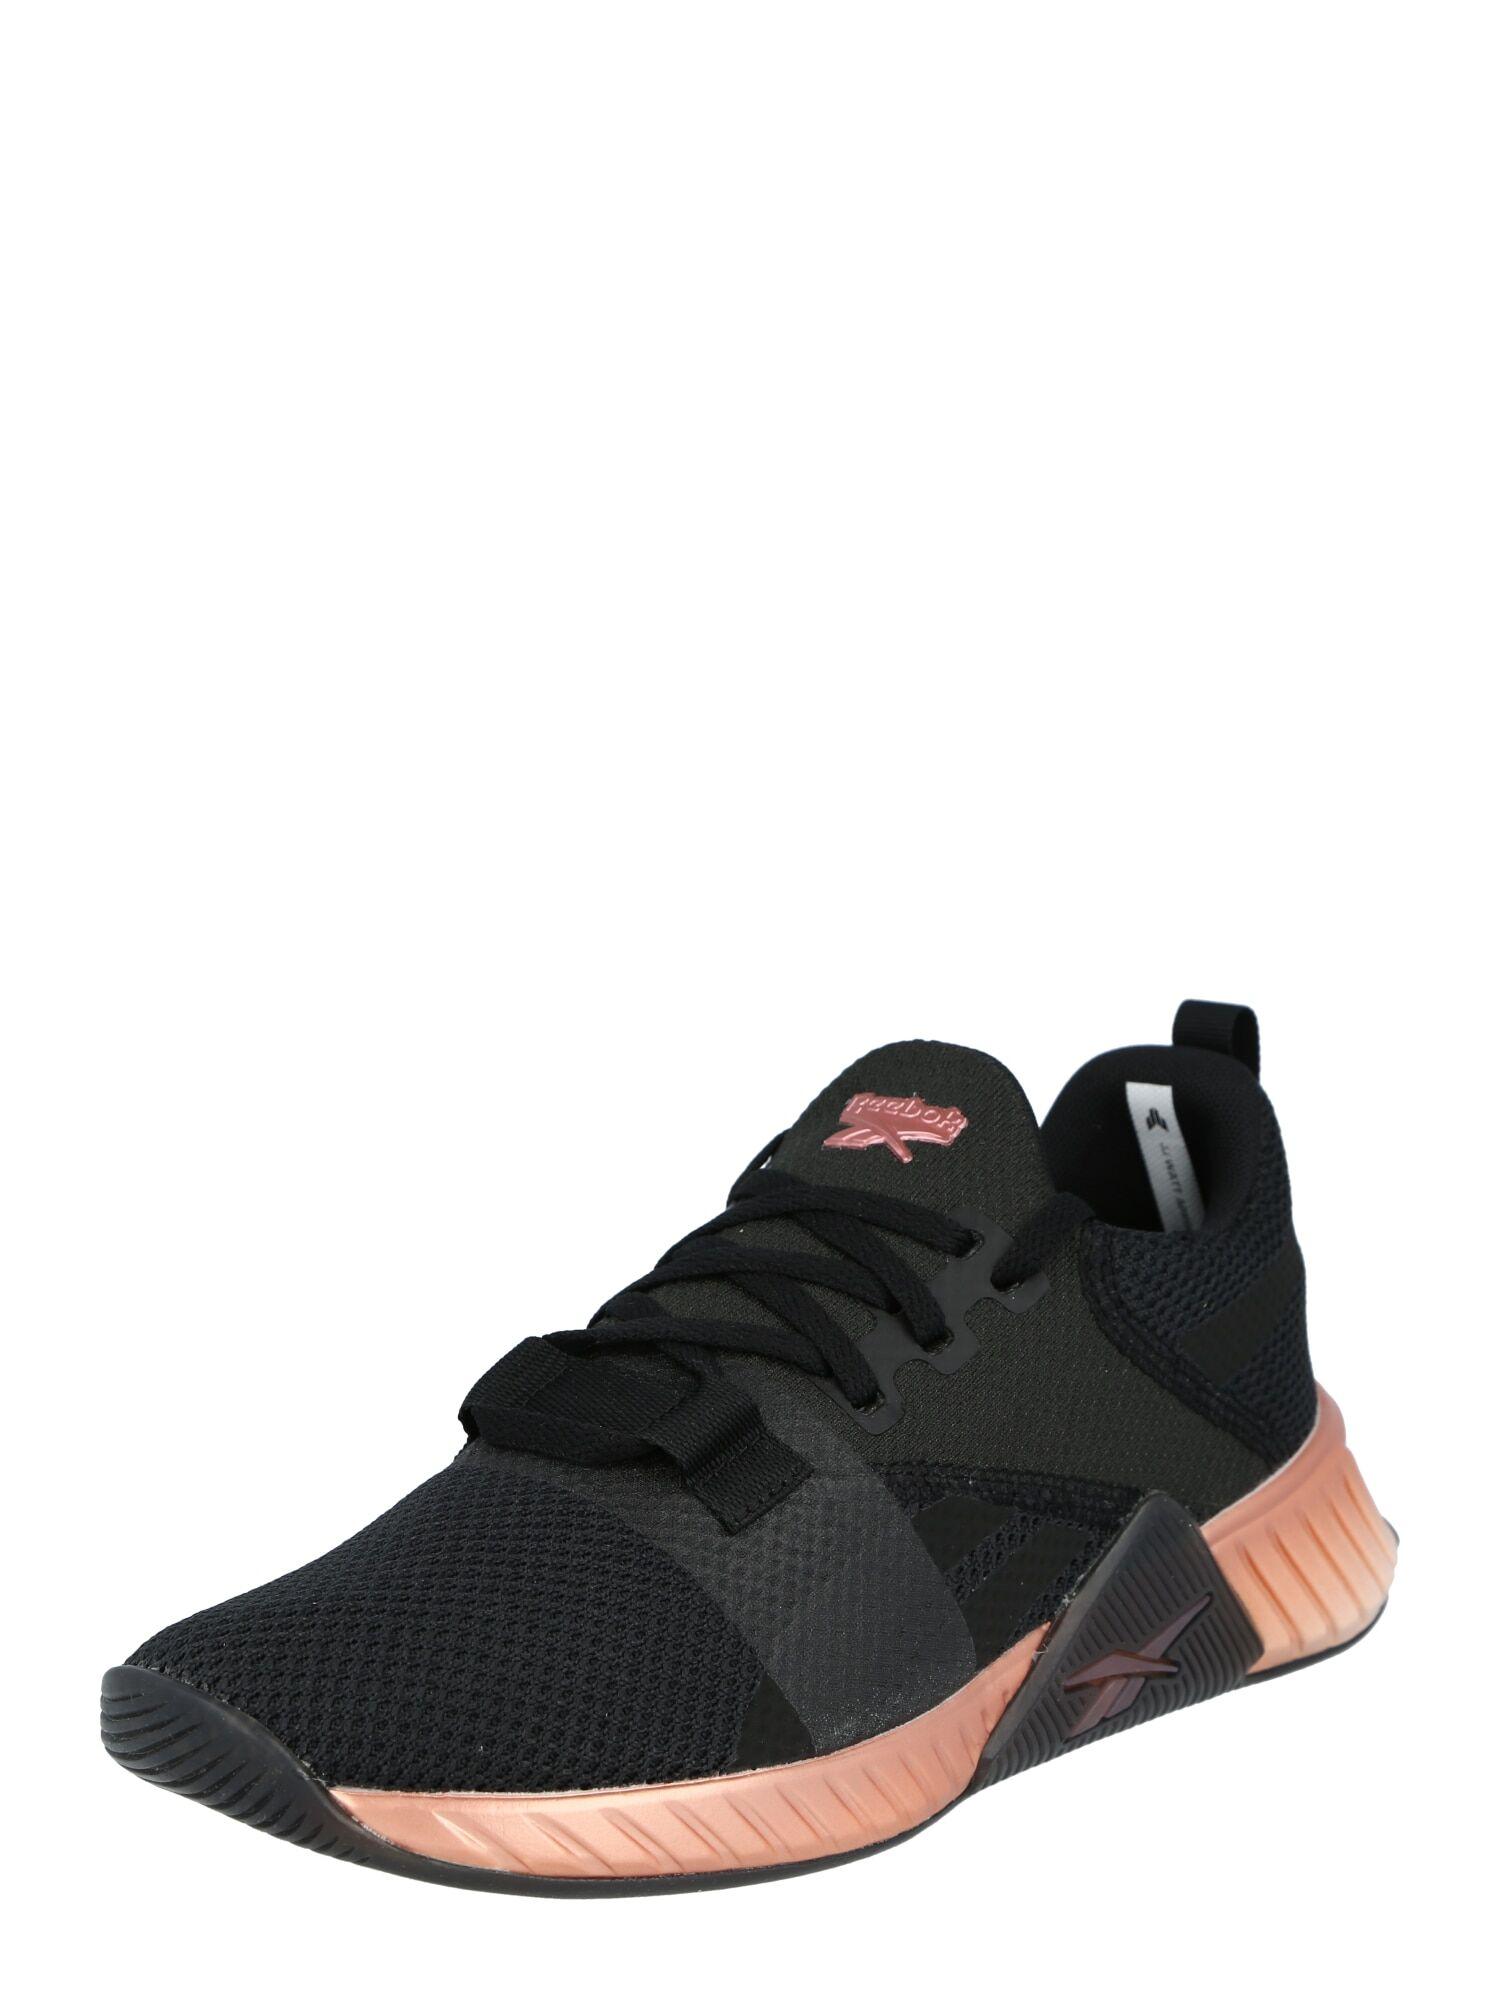 REEBOK Chaussure de sport 'FLASHFILM TRAIN 2.0'  - Noir - Taille: 3 - female